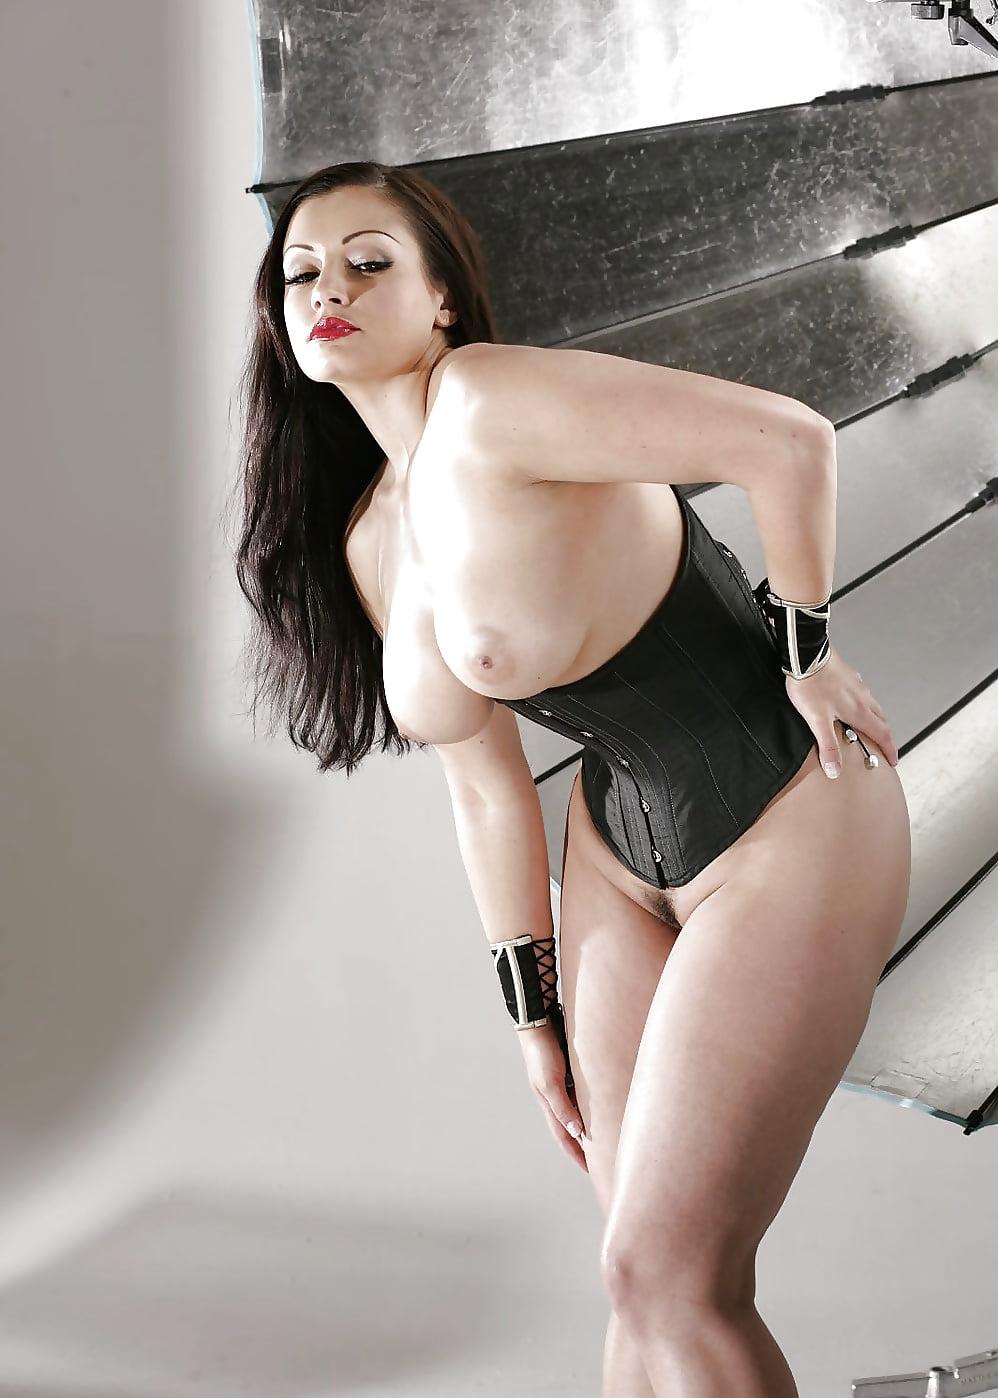 girls-aria-giovanni-chubby-nudes-opera